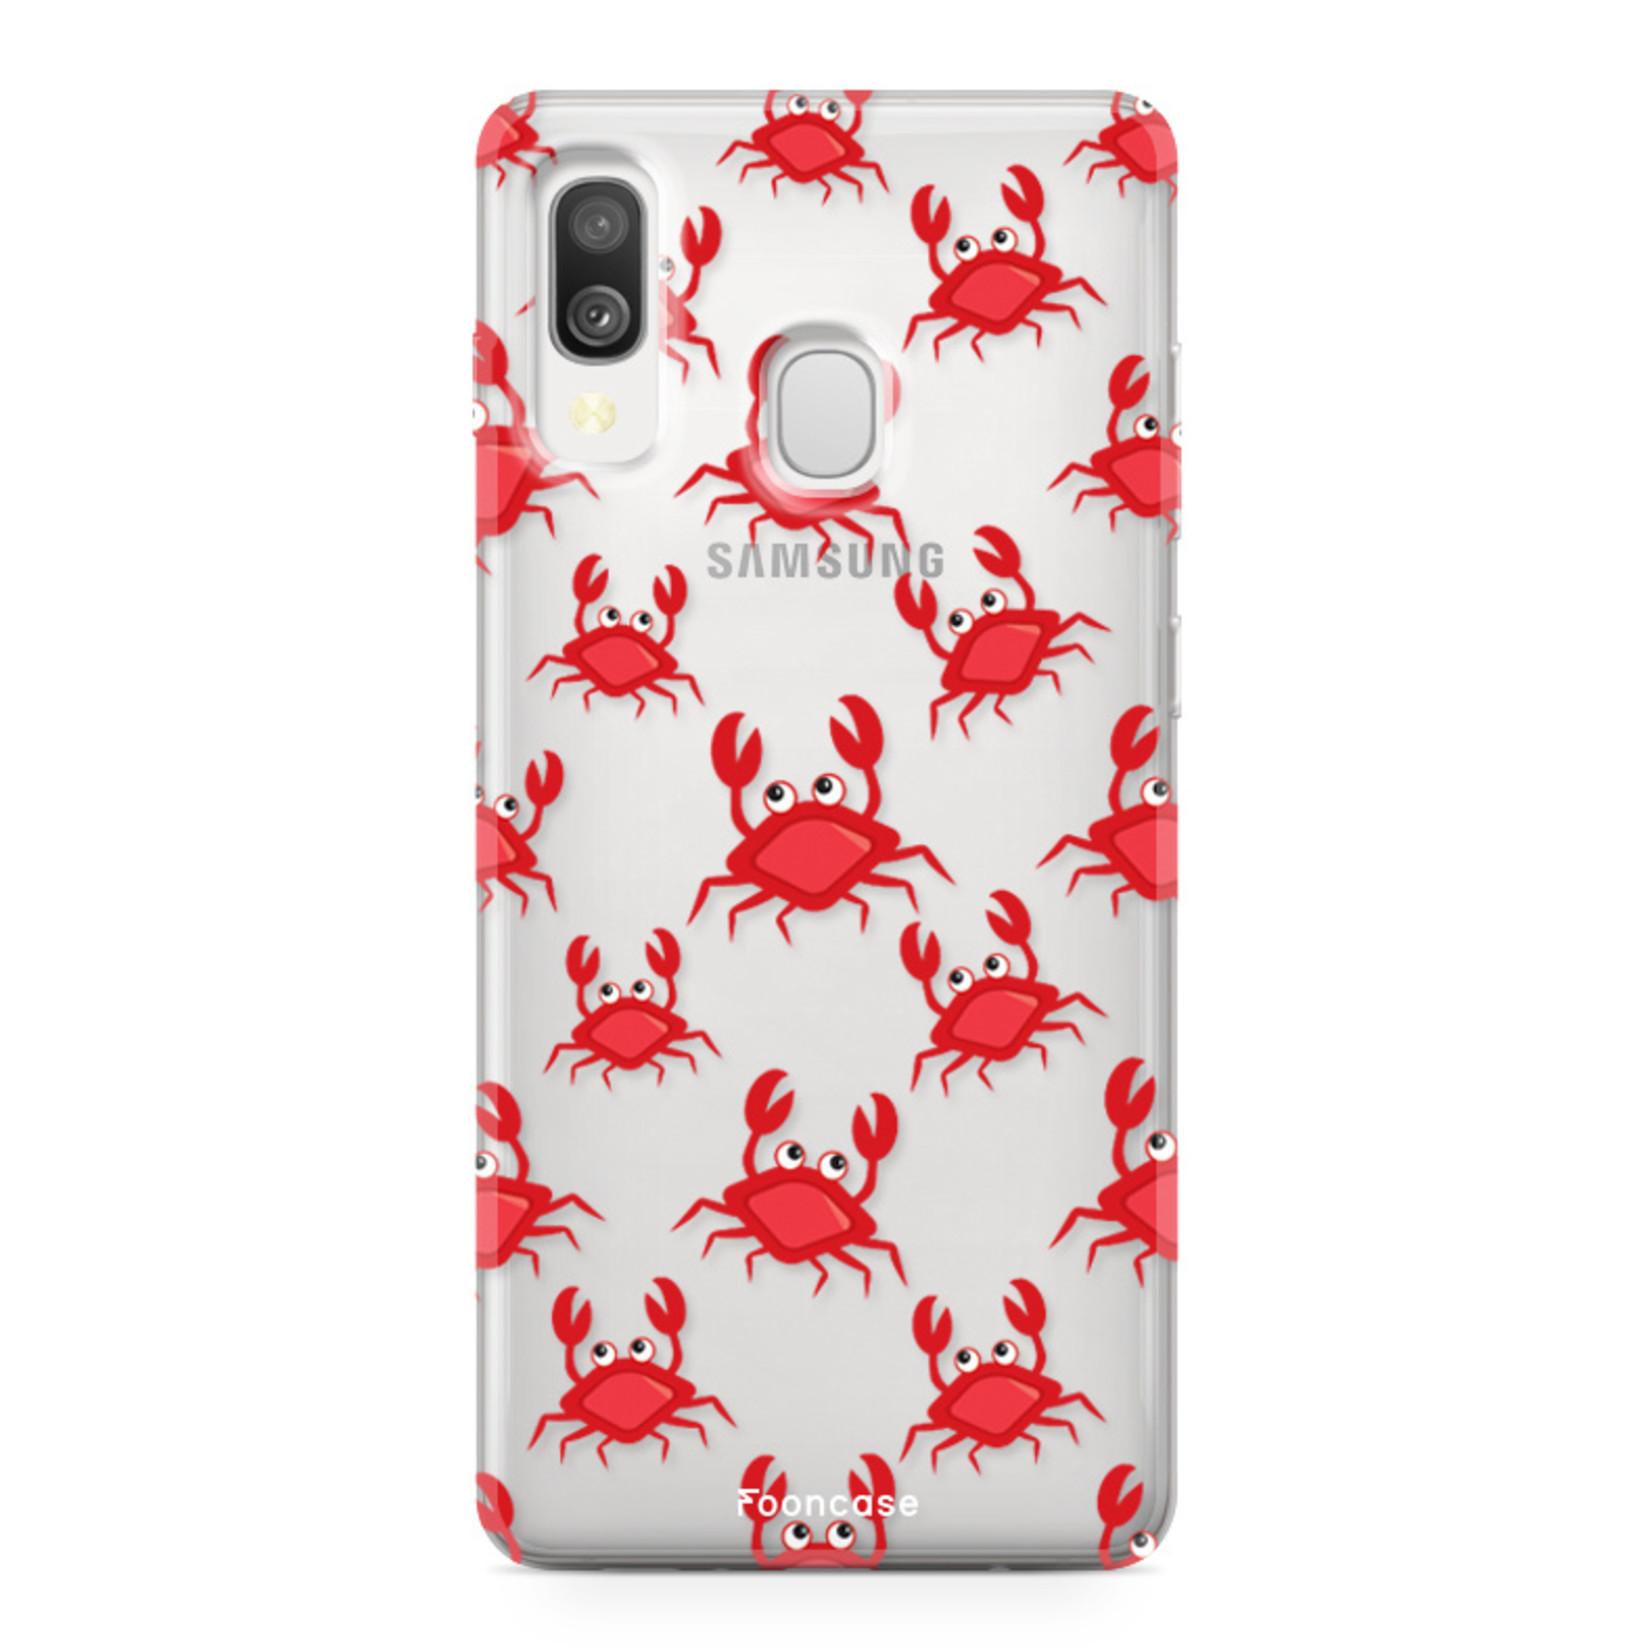 Samsung Galaxy A40 hoesje TPU Soft Case - Back Cover - Crabs / Krabbetjes / Krabben